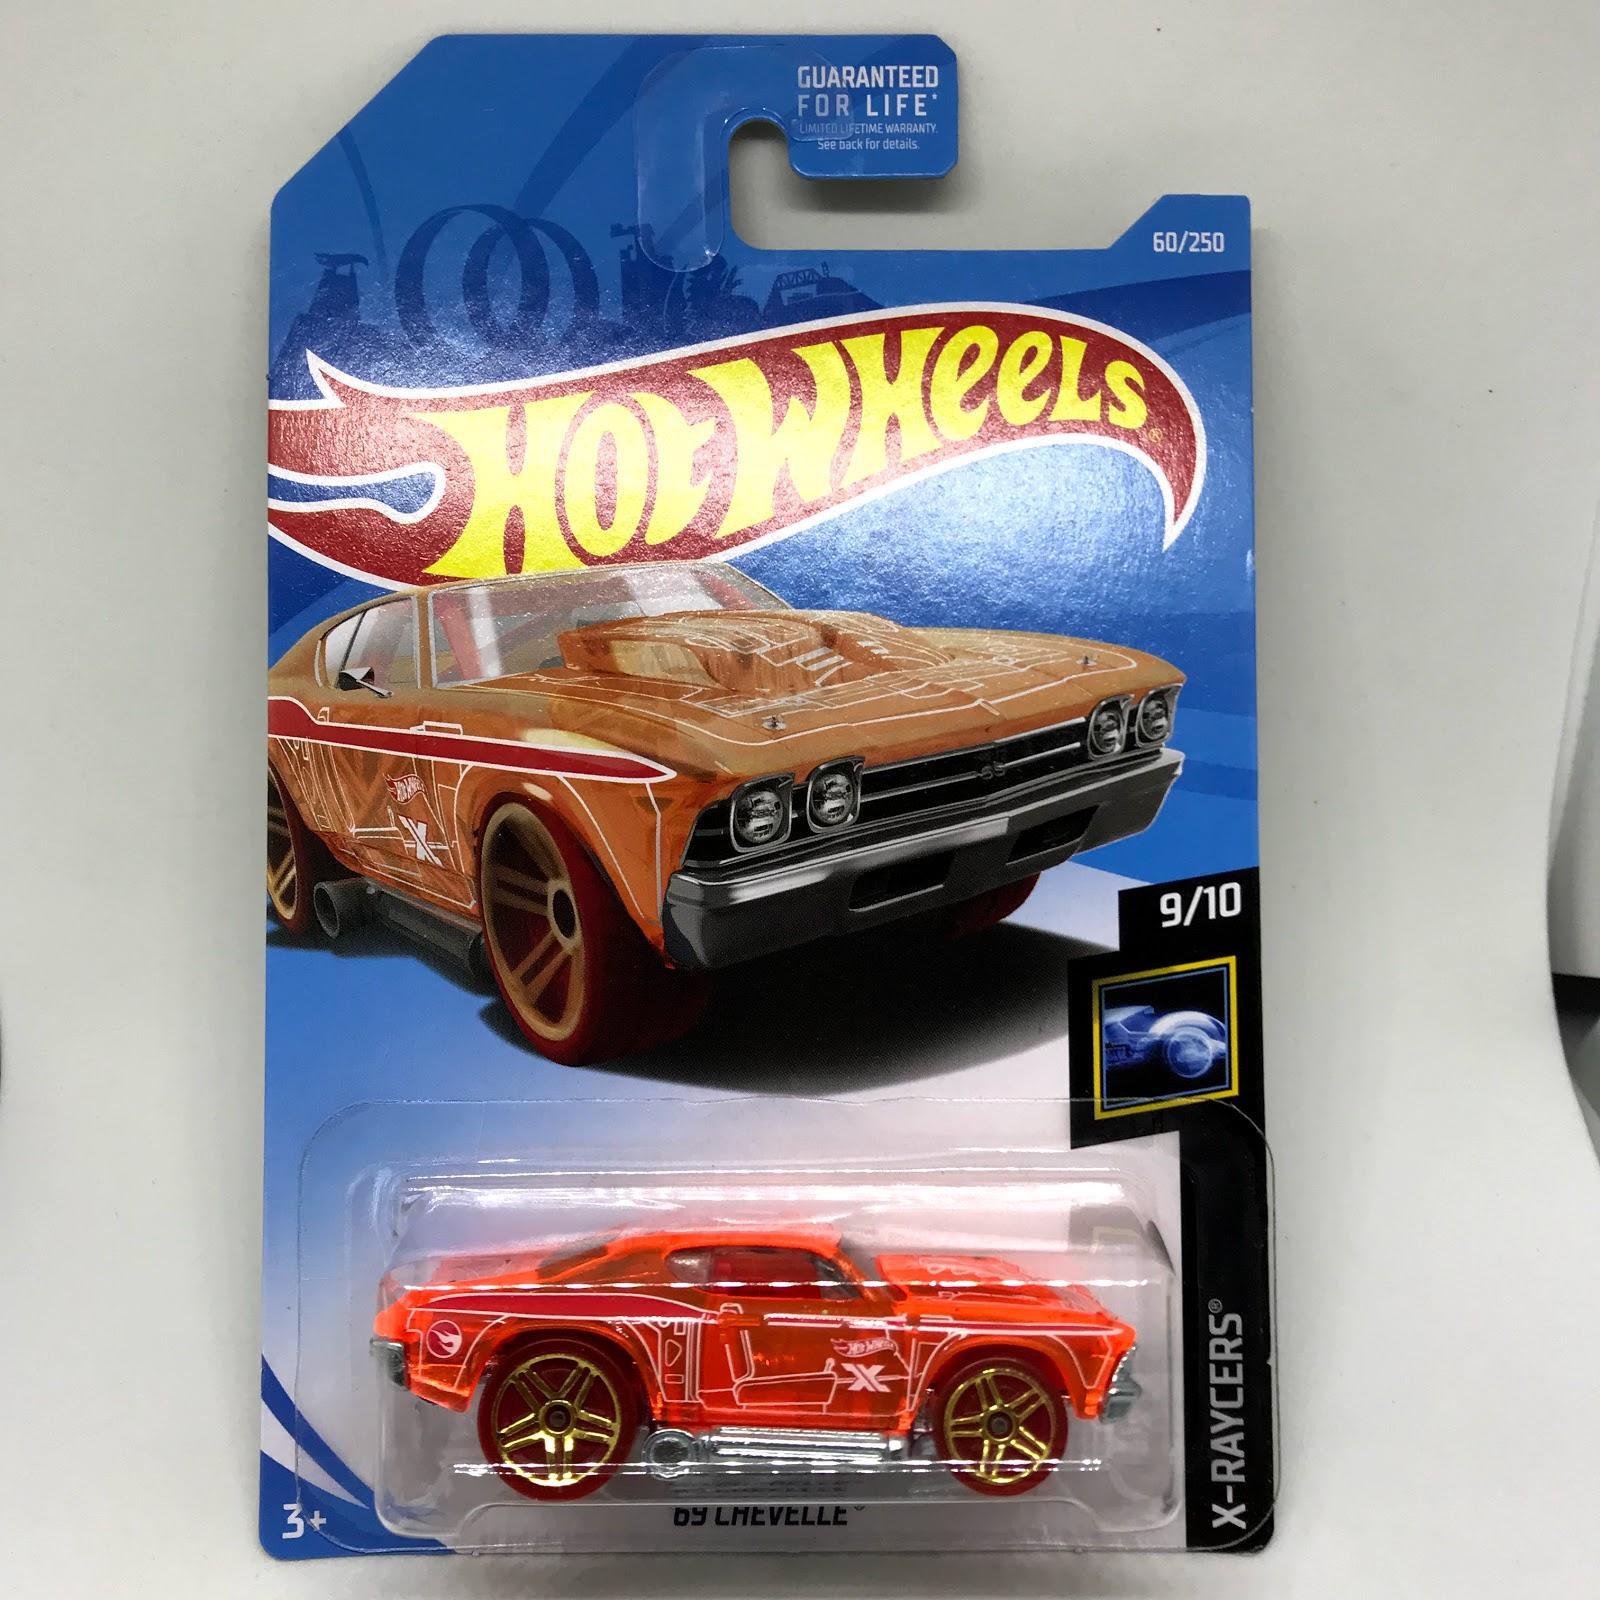 2019 Hot Wheels X-RACERS 9//10 Seceret Treasure Hunt /'69 Chevelle 60//250